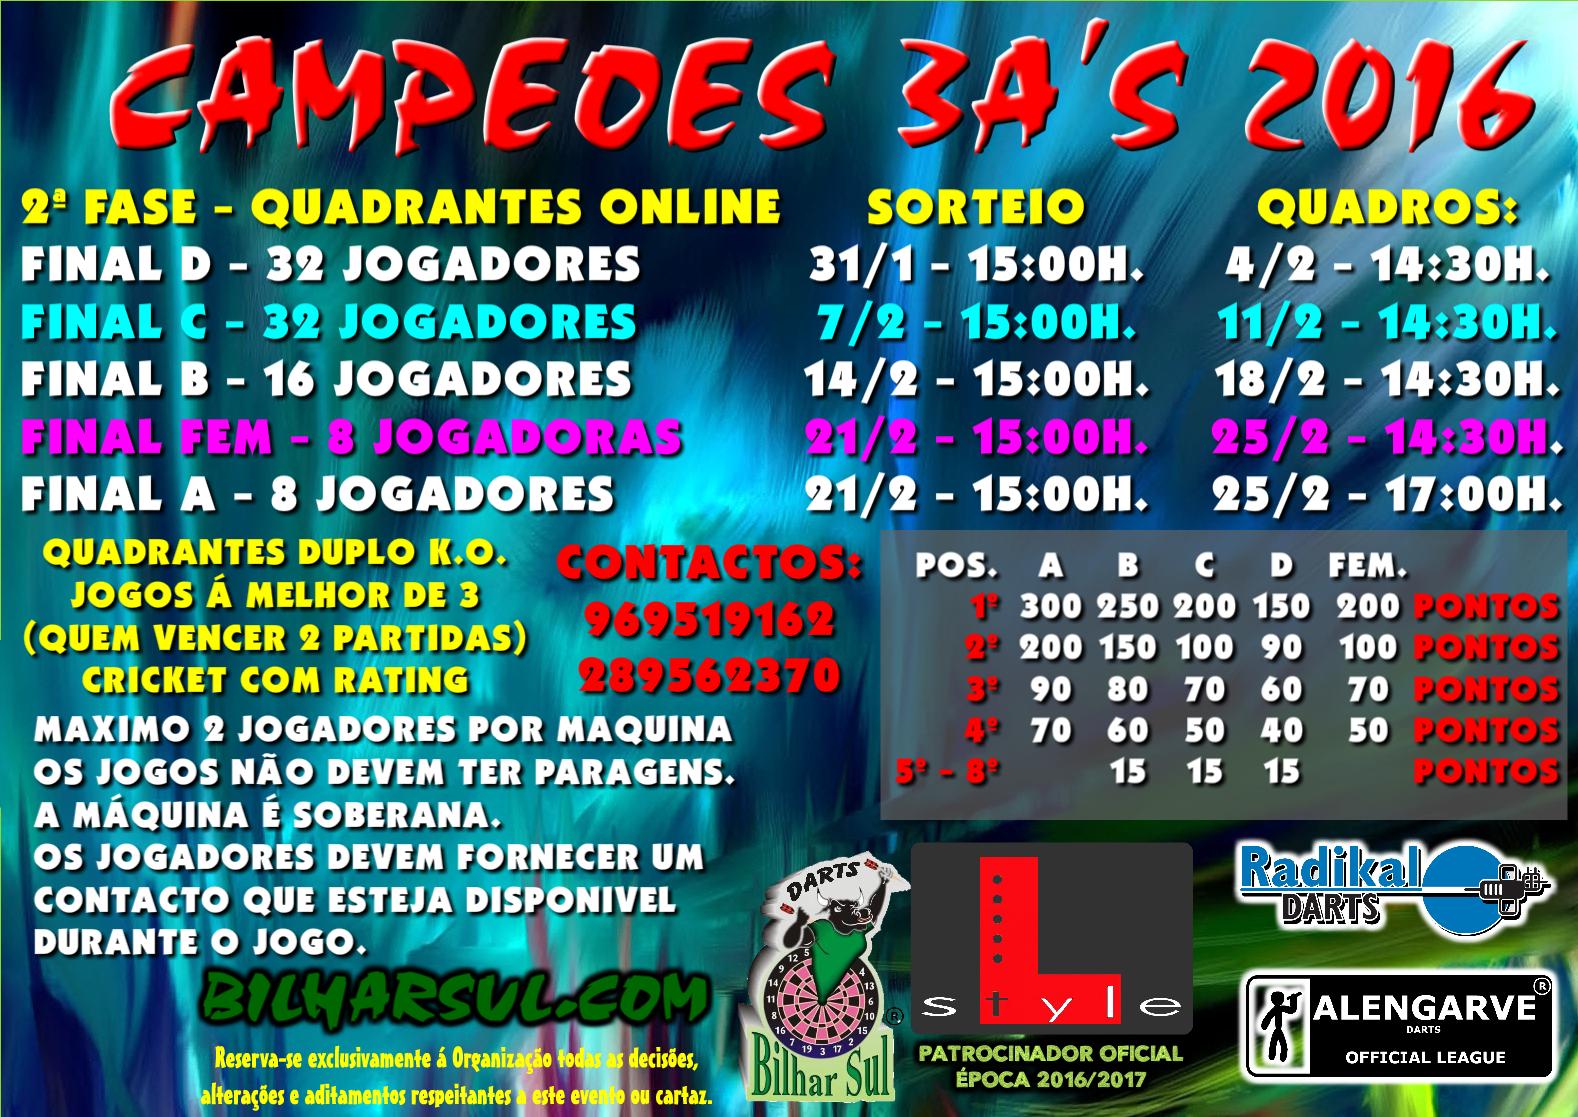 Campeões 3A's 2016